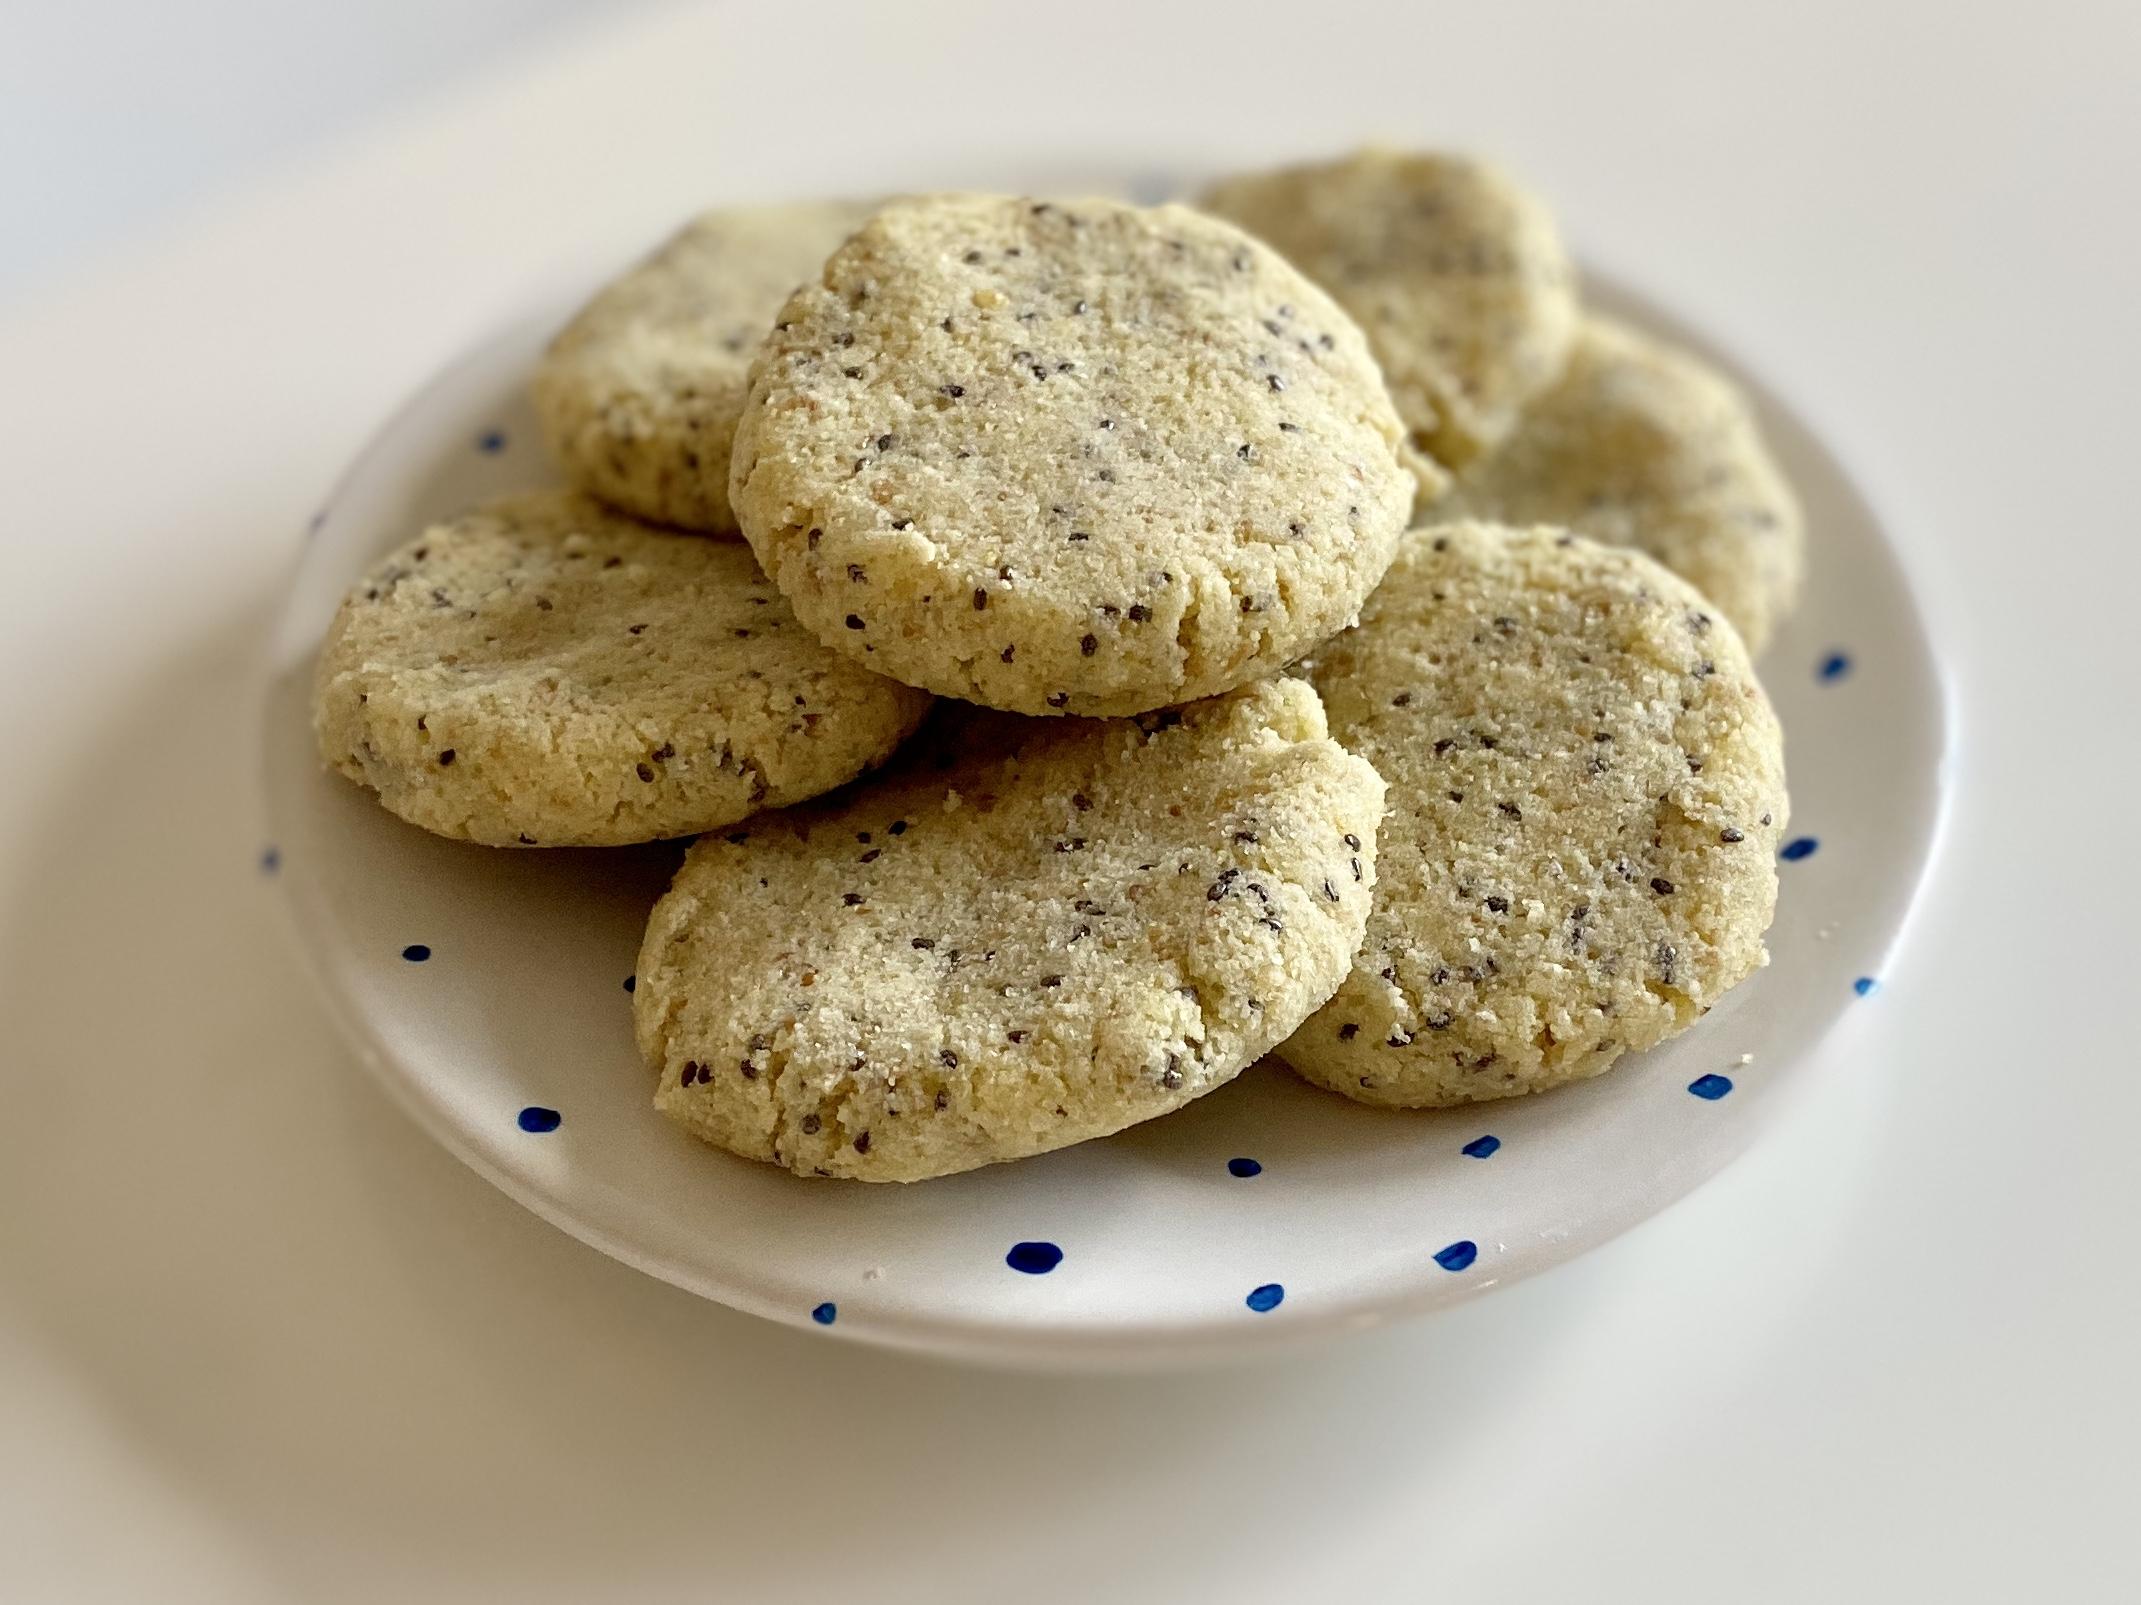 Keto Shortbread Cookies - Lemon Chia Seed Shortbread